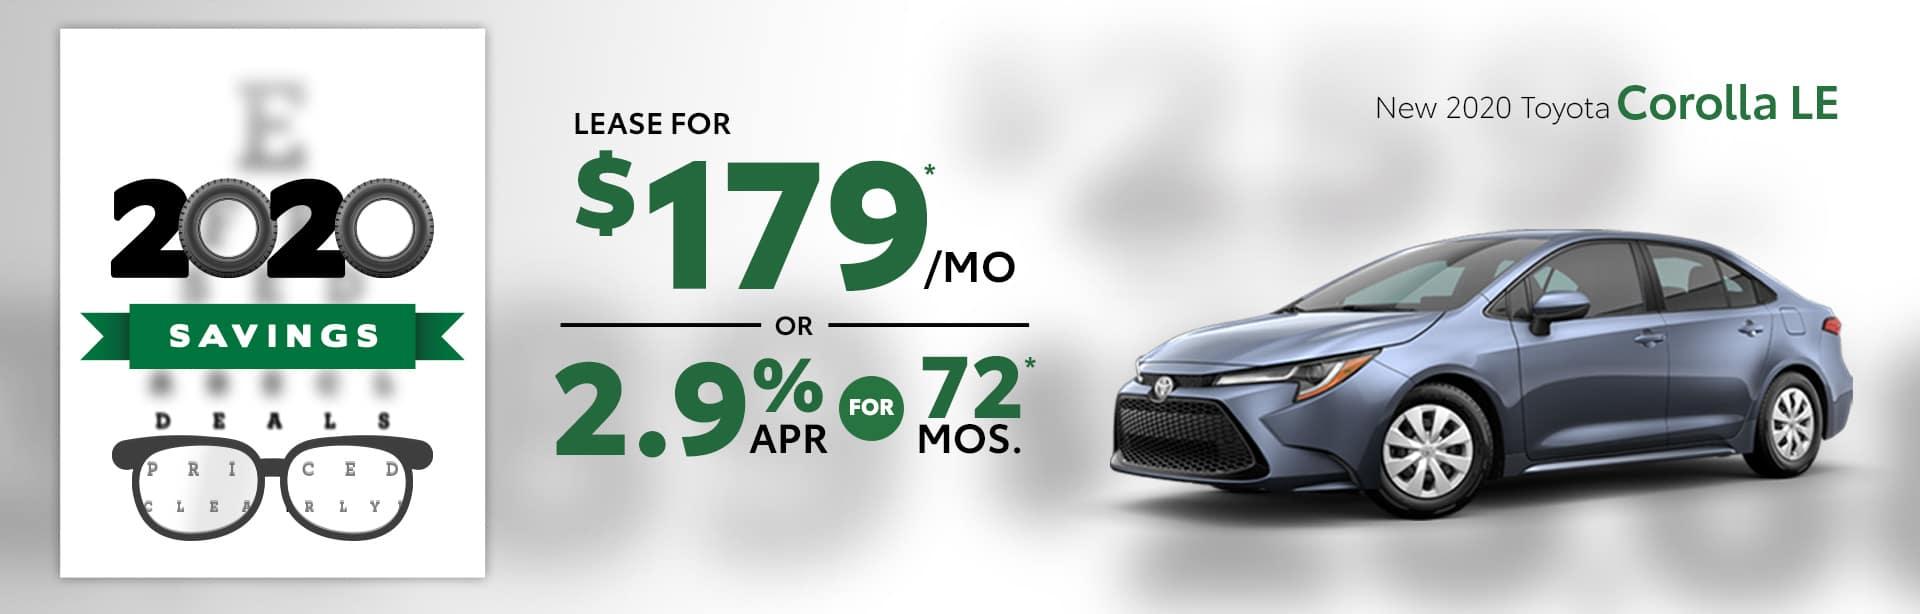 New 2020 Toyota Corolla Albertville AL